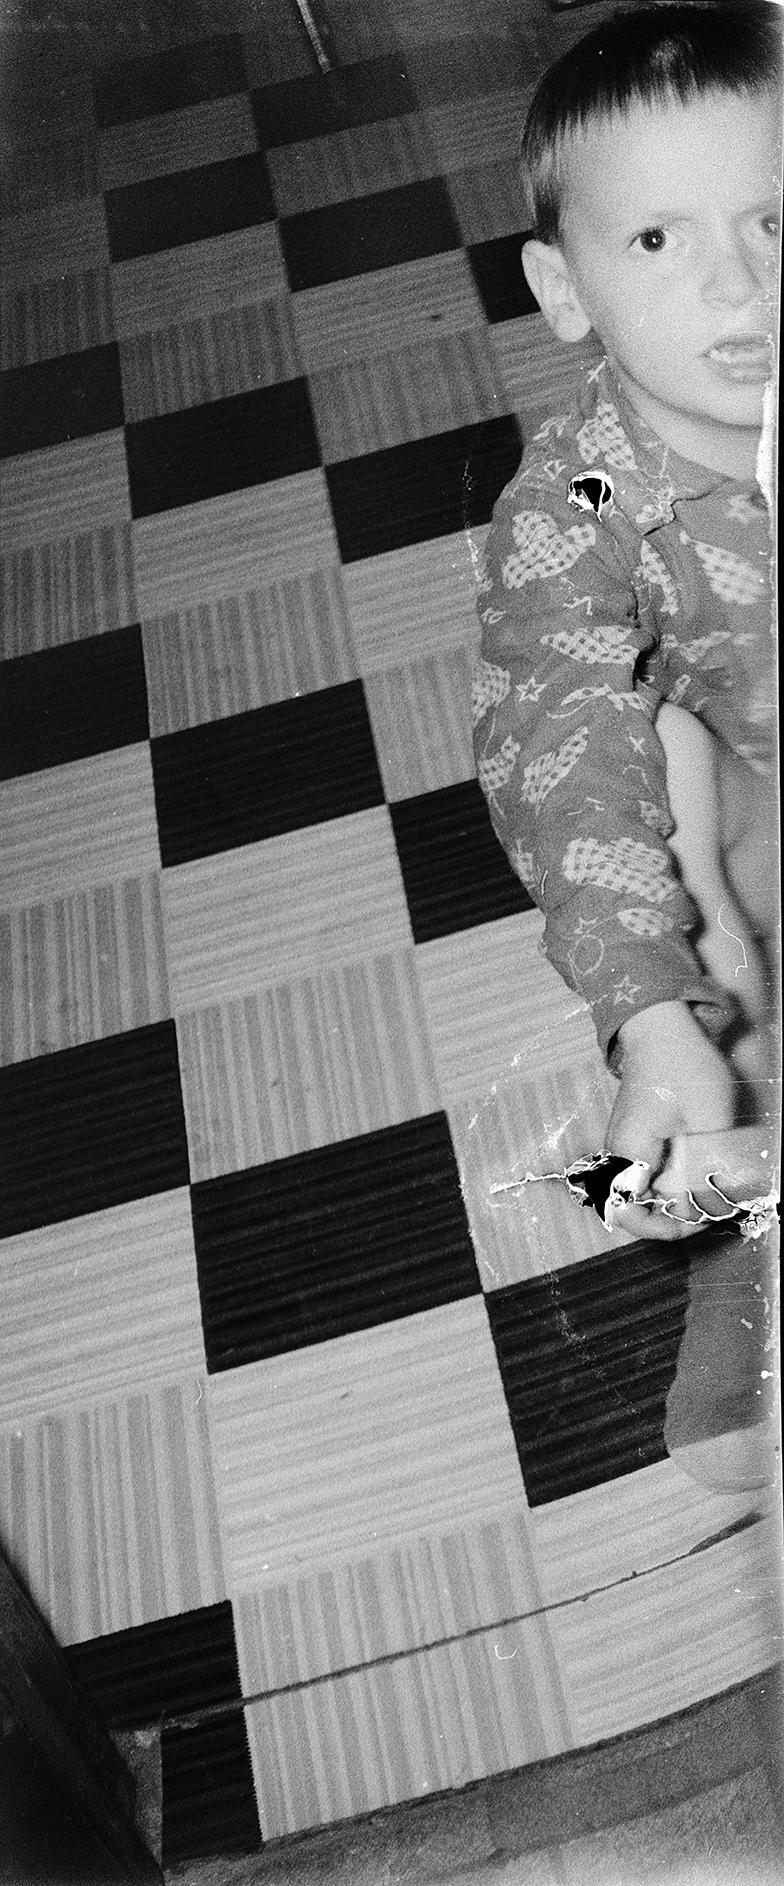 Paul Bundle 41 Roll 13 001.jpg